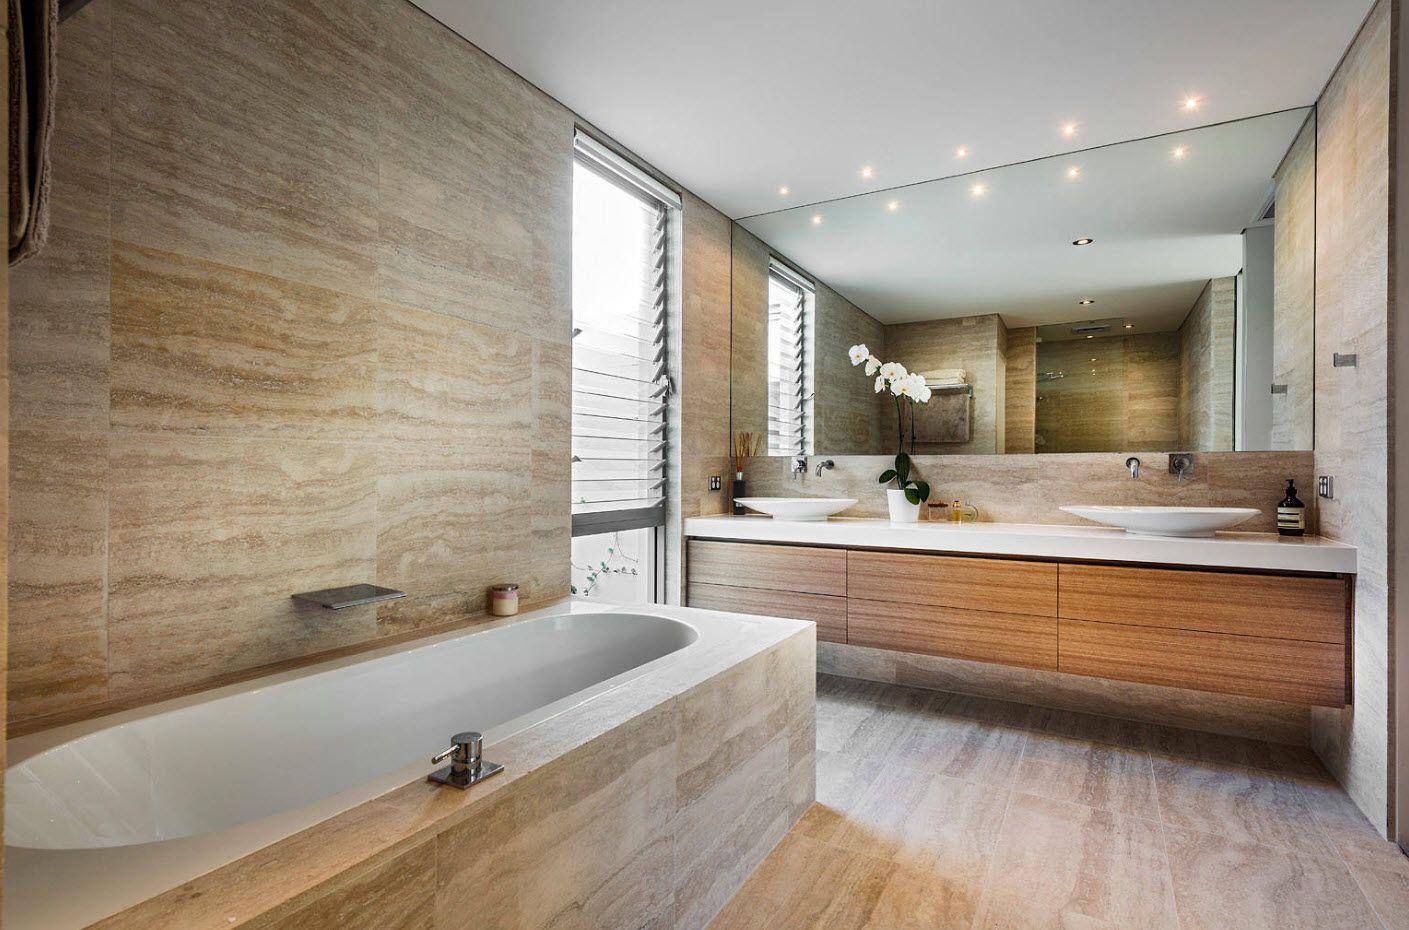 Bathroom Design Trends Decoration Ideas Small Design Ideas - Bathroom design trends 2017